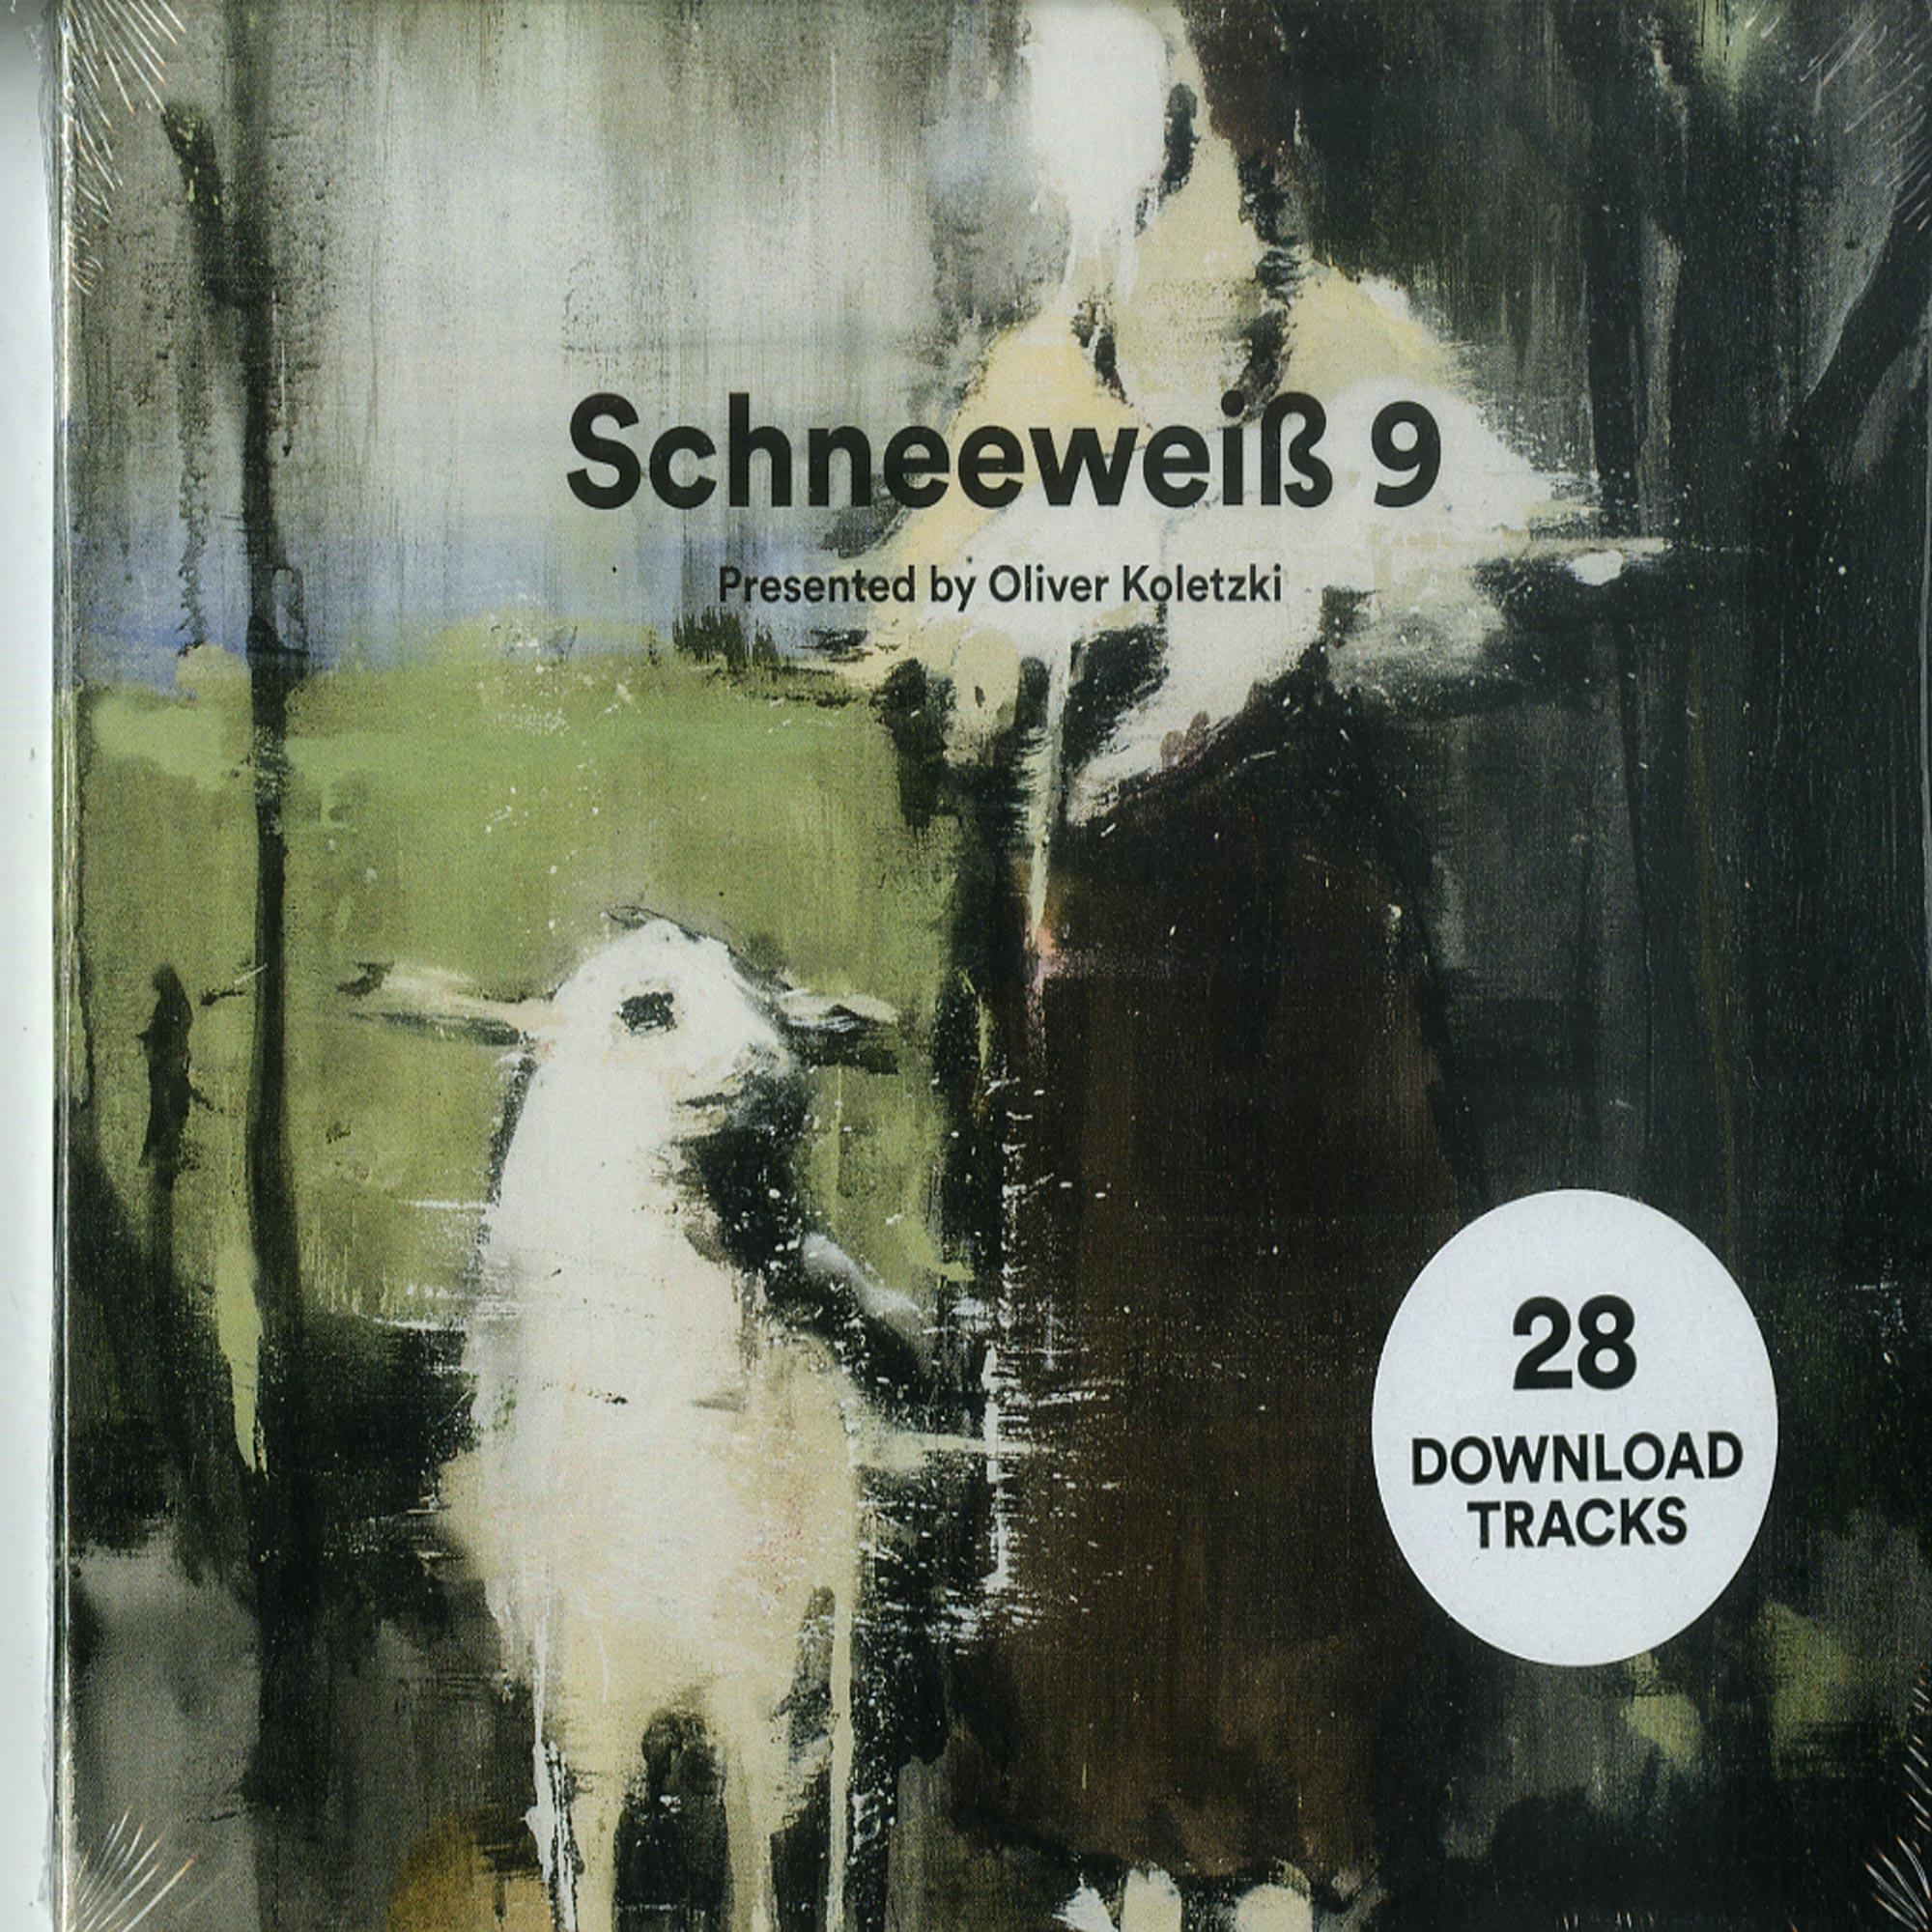 Various Artists - SCHNEEWEIß 9 PRESENTED BY OLIVER KOLETZKI